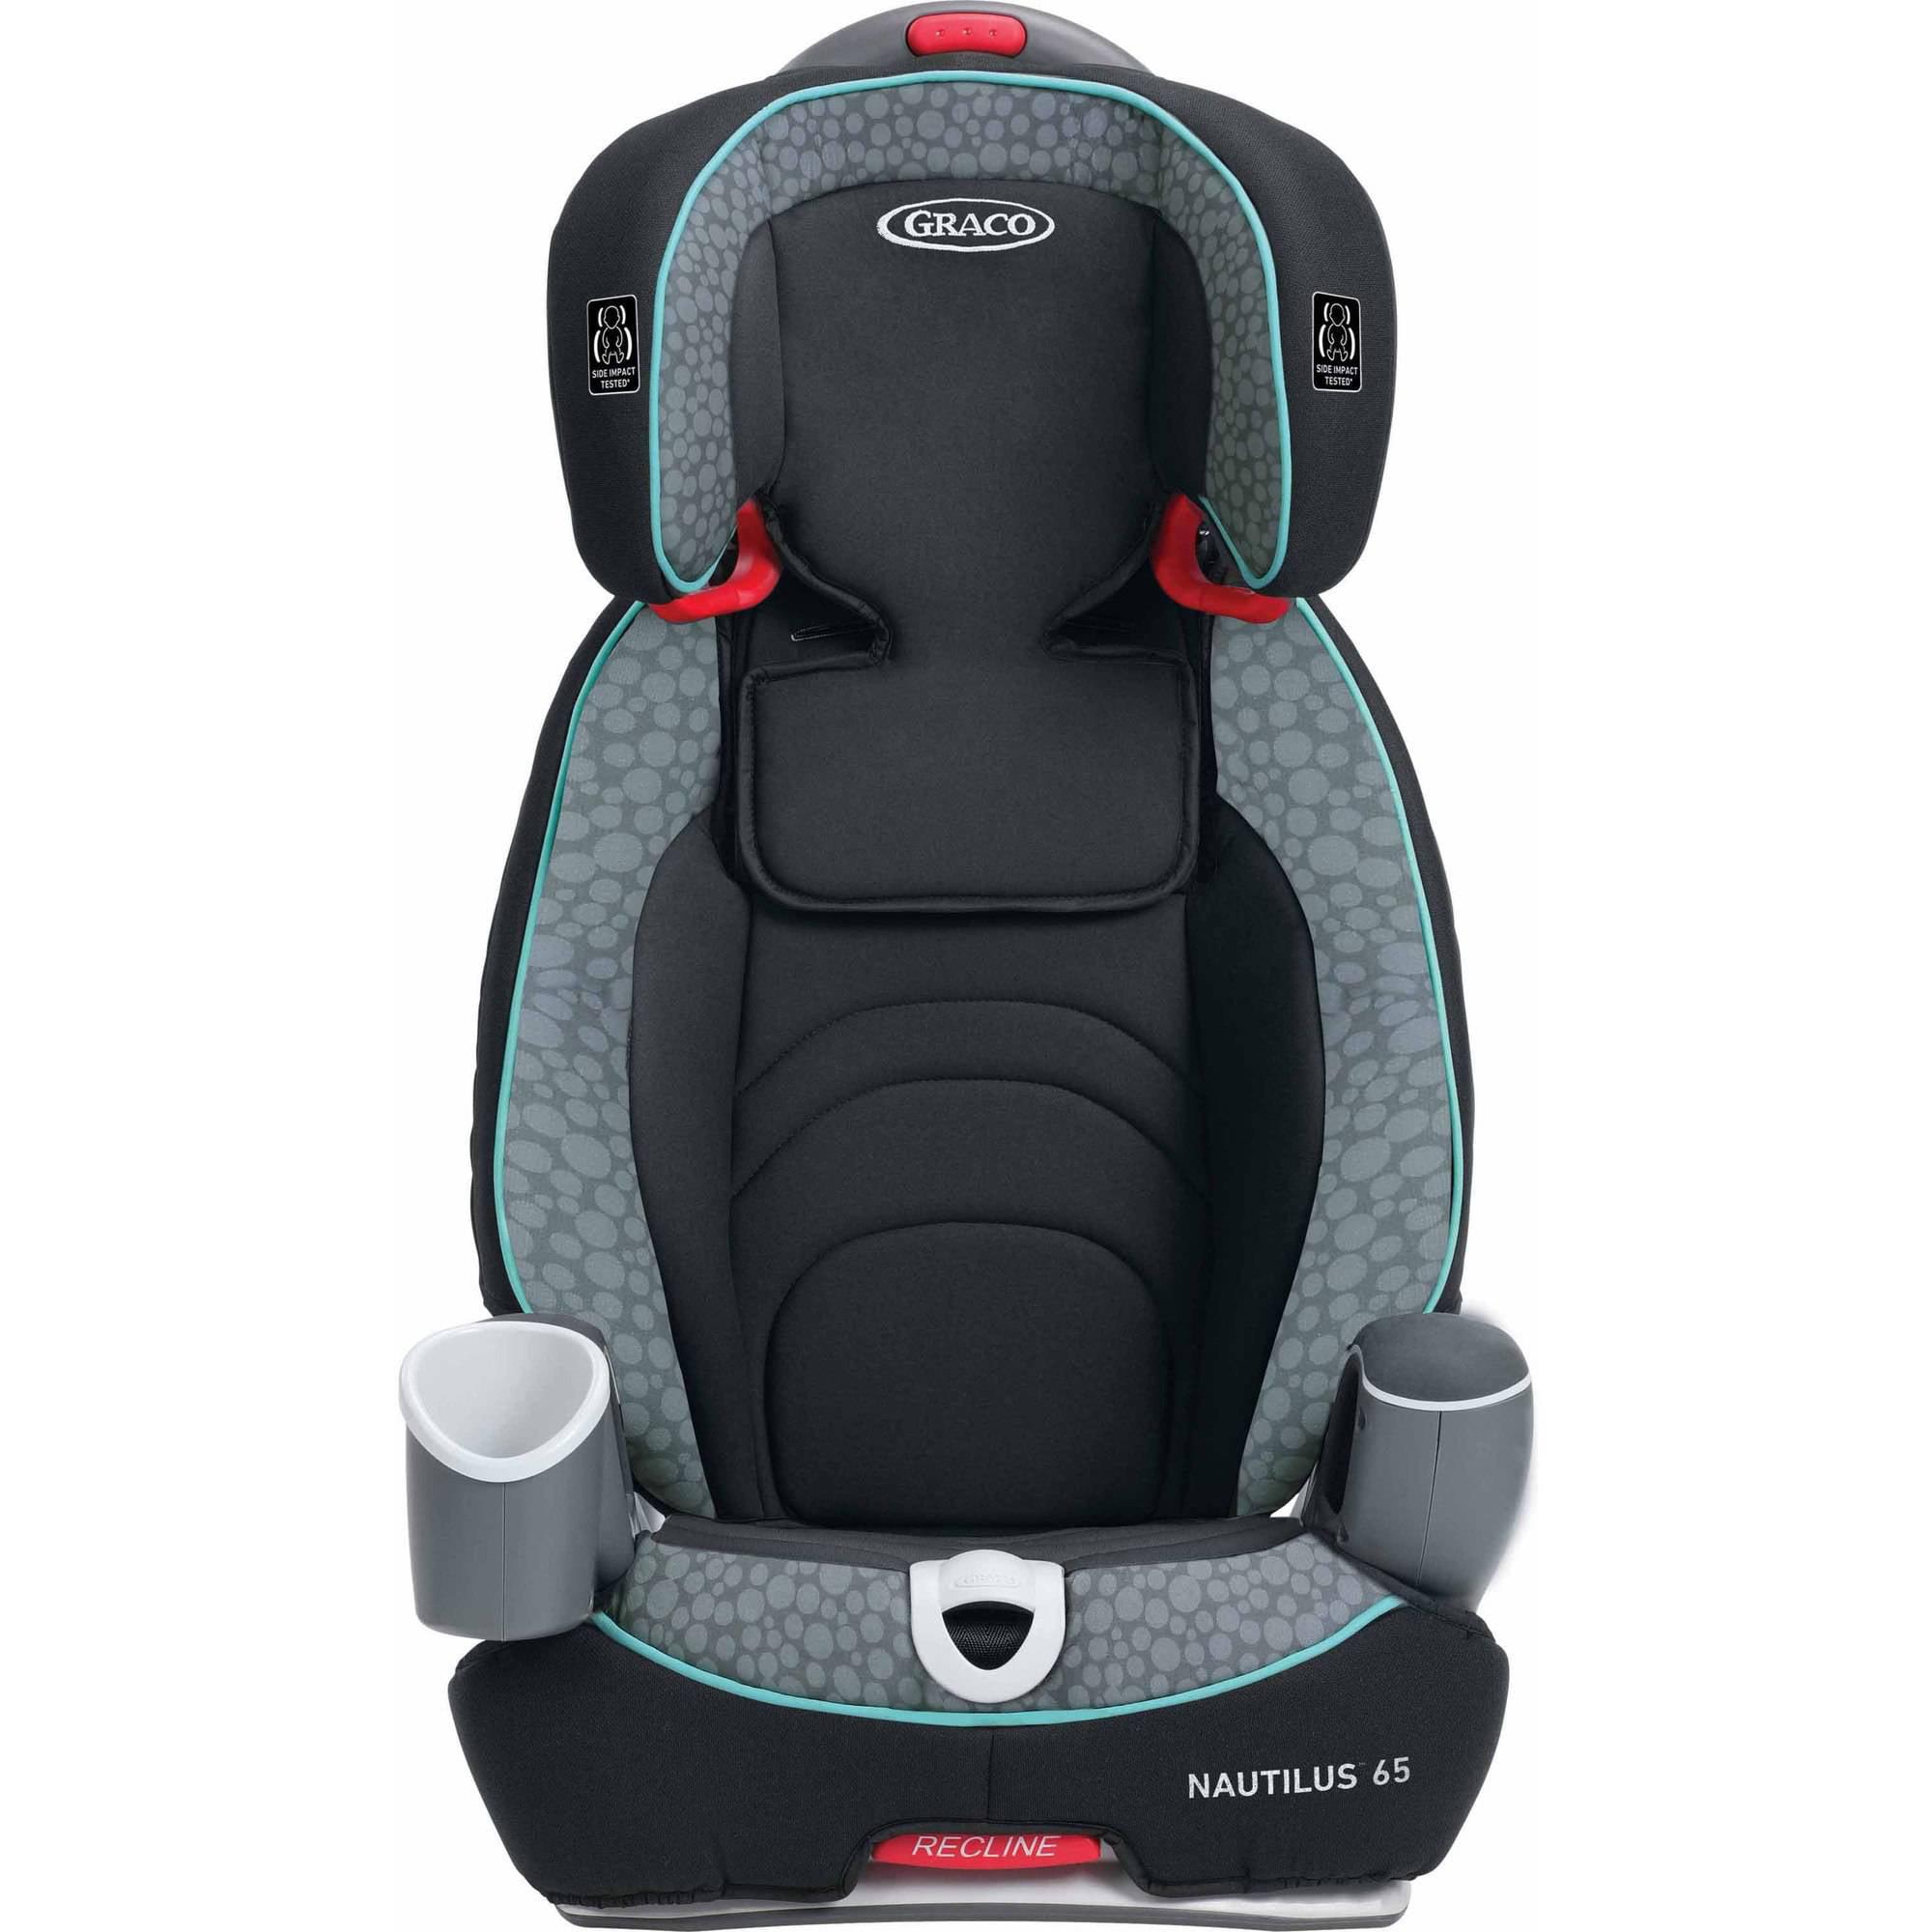 Graco Multi Use Harness Booster Car Seat